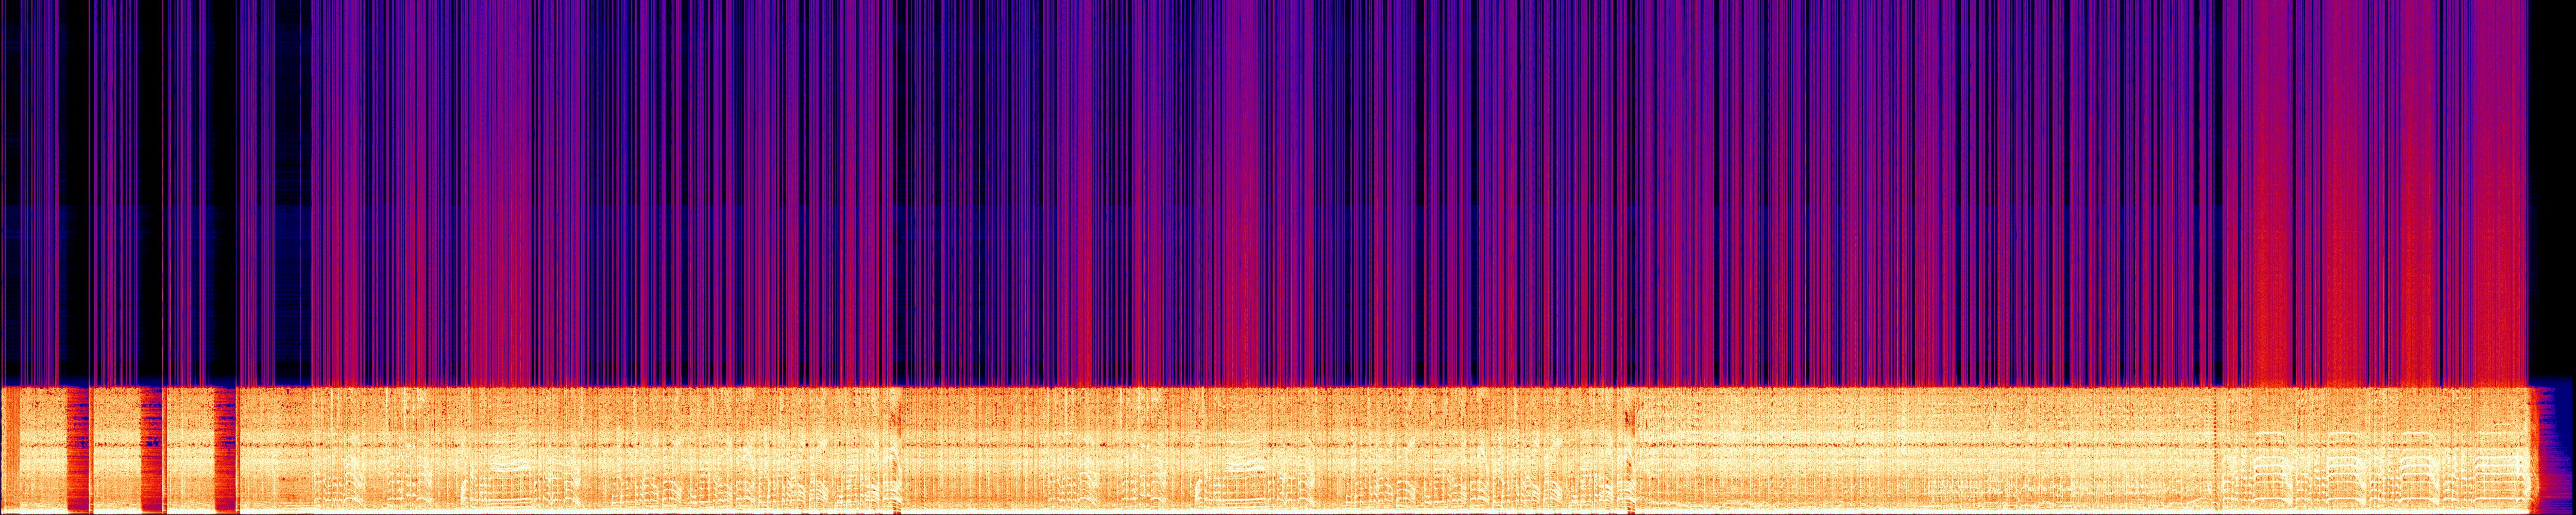 File:FSsongmetal2-MP3-LAME3.99.5-47kbps.png - Wikimedia Commons